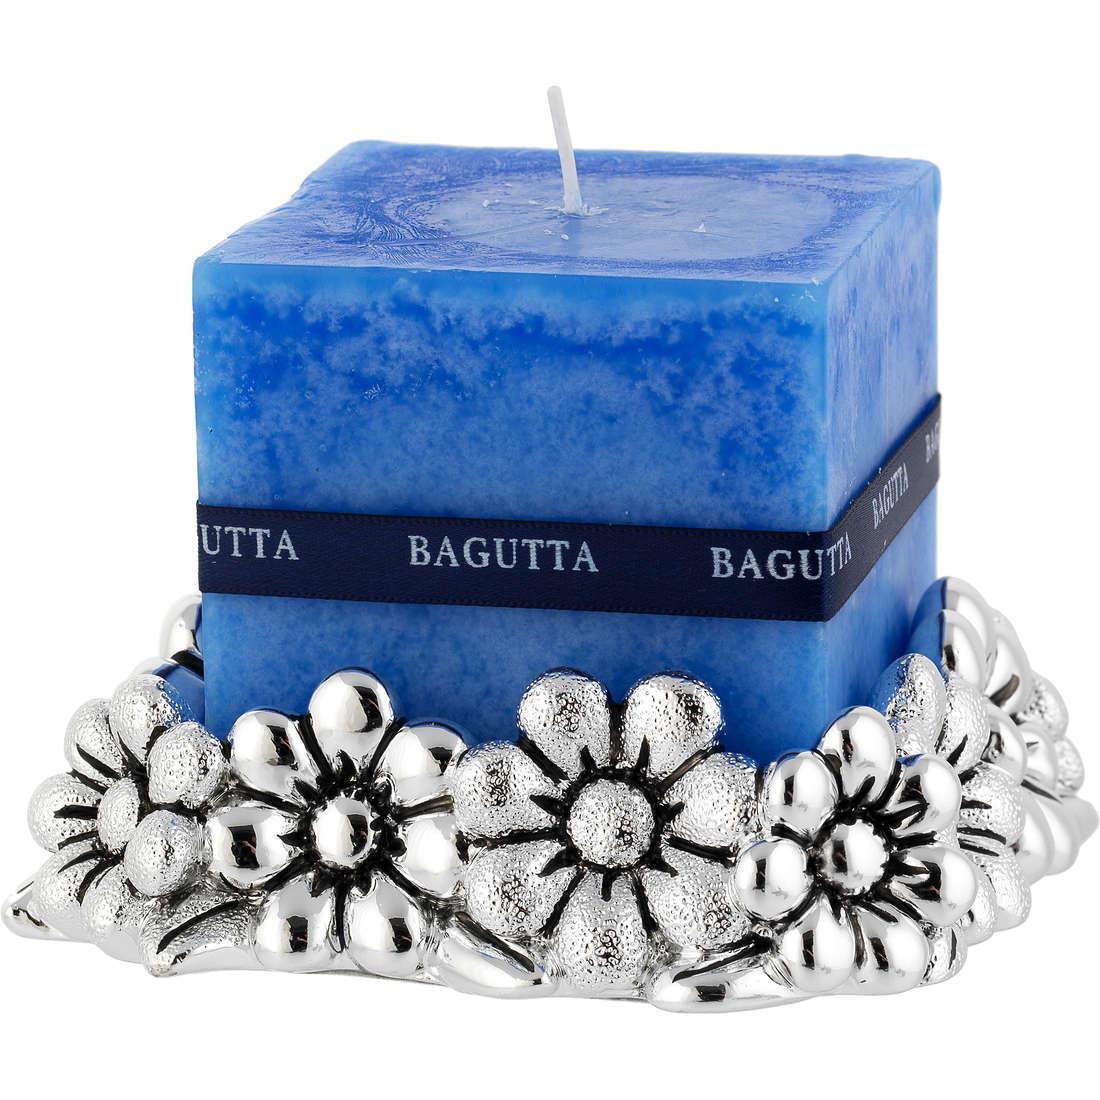 oggettistica Bagutta 1866-03 AZ